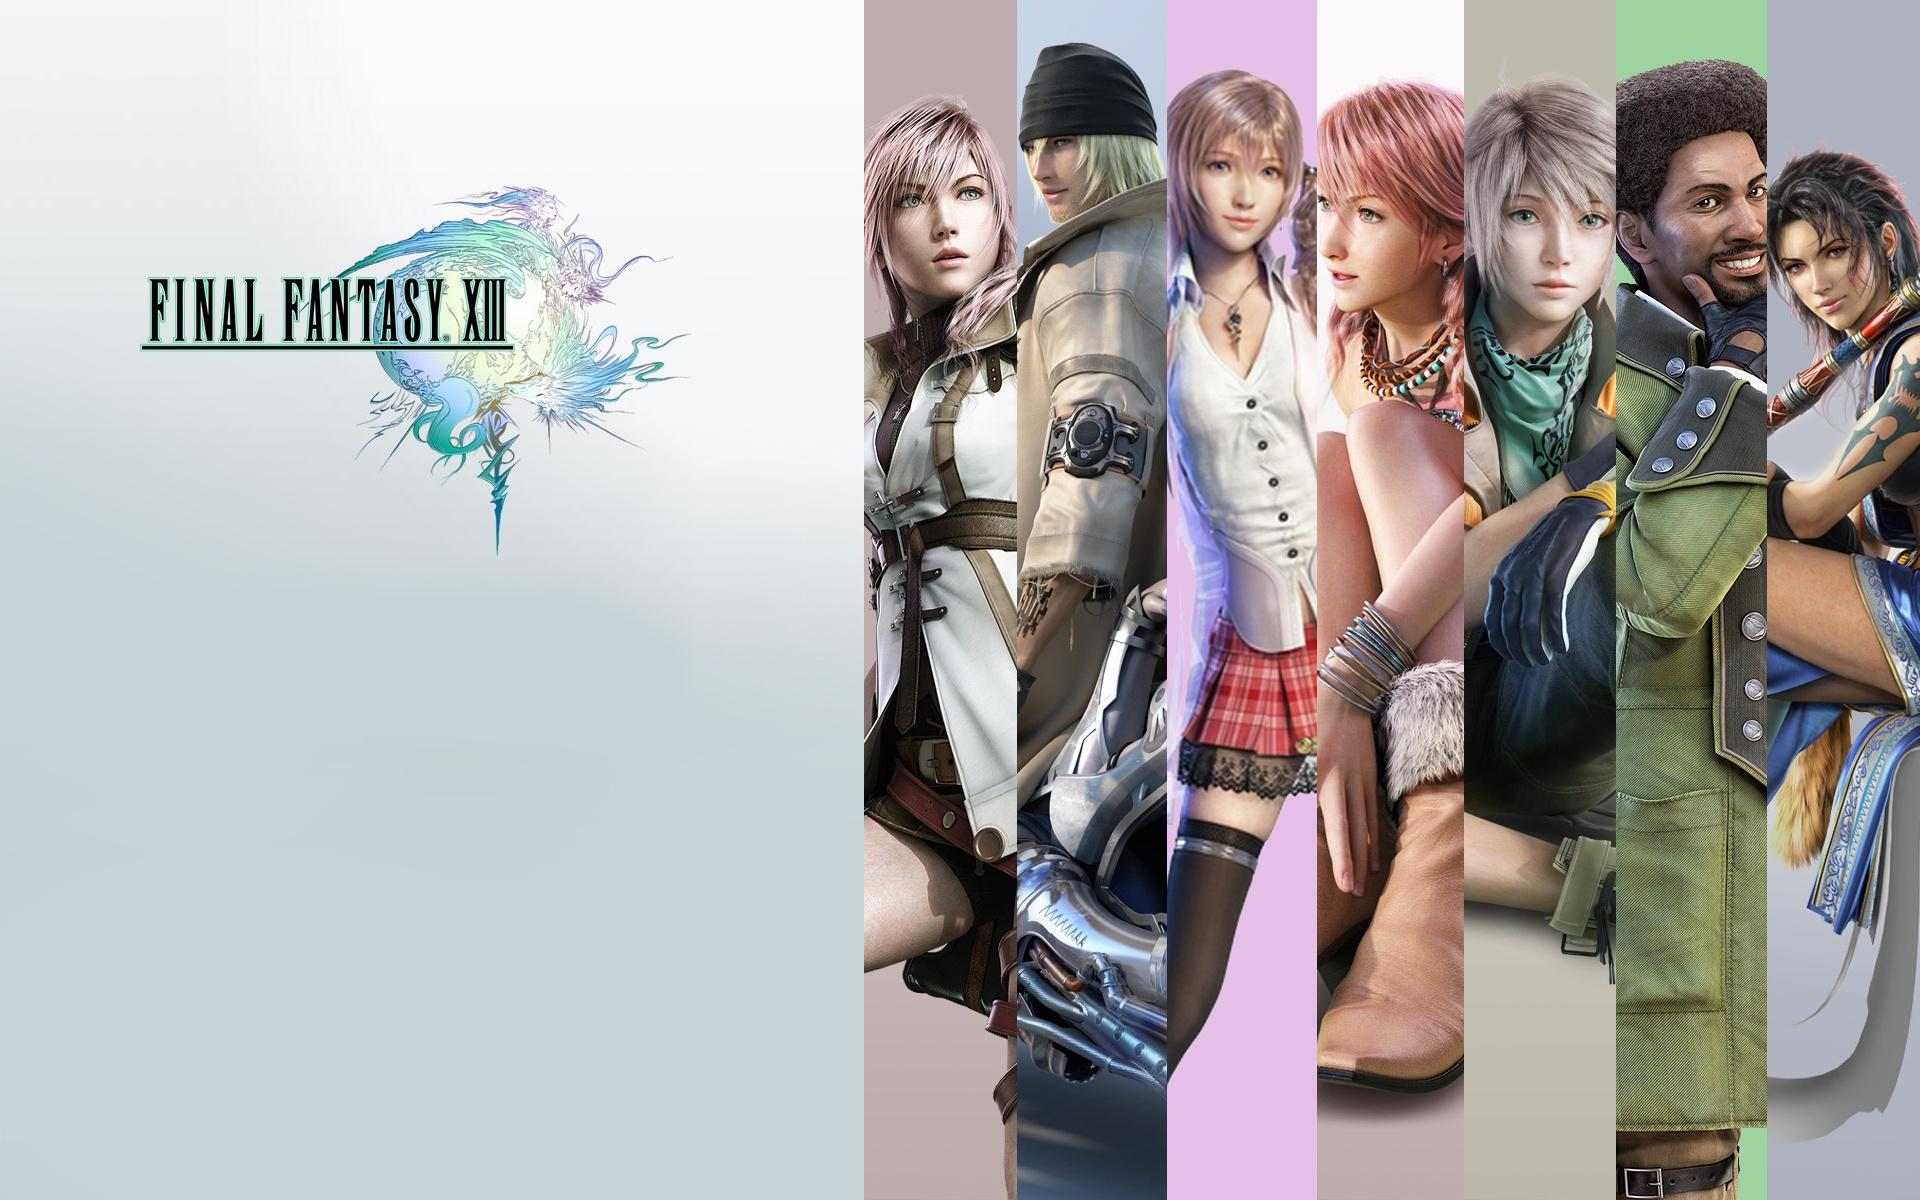 Final Fantasy XIII trilogy remaster?